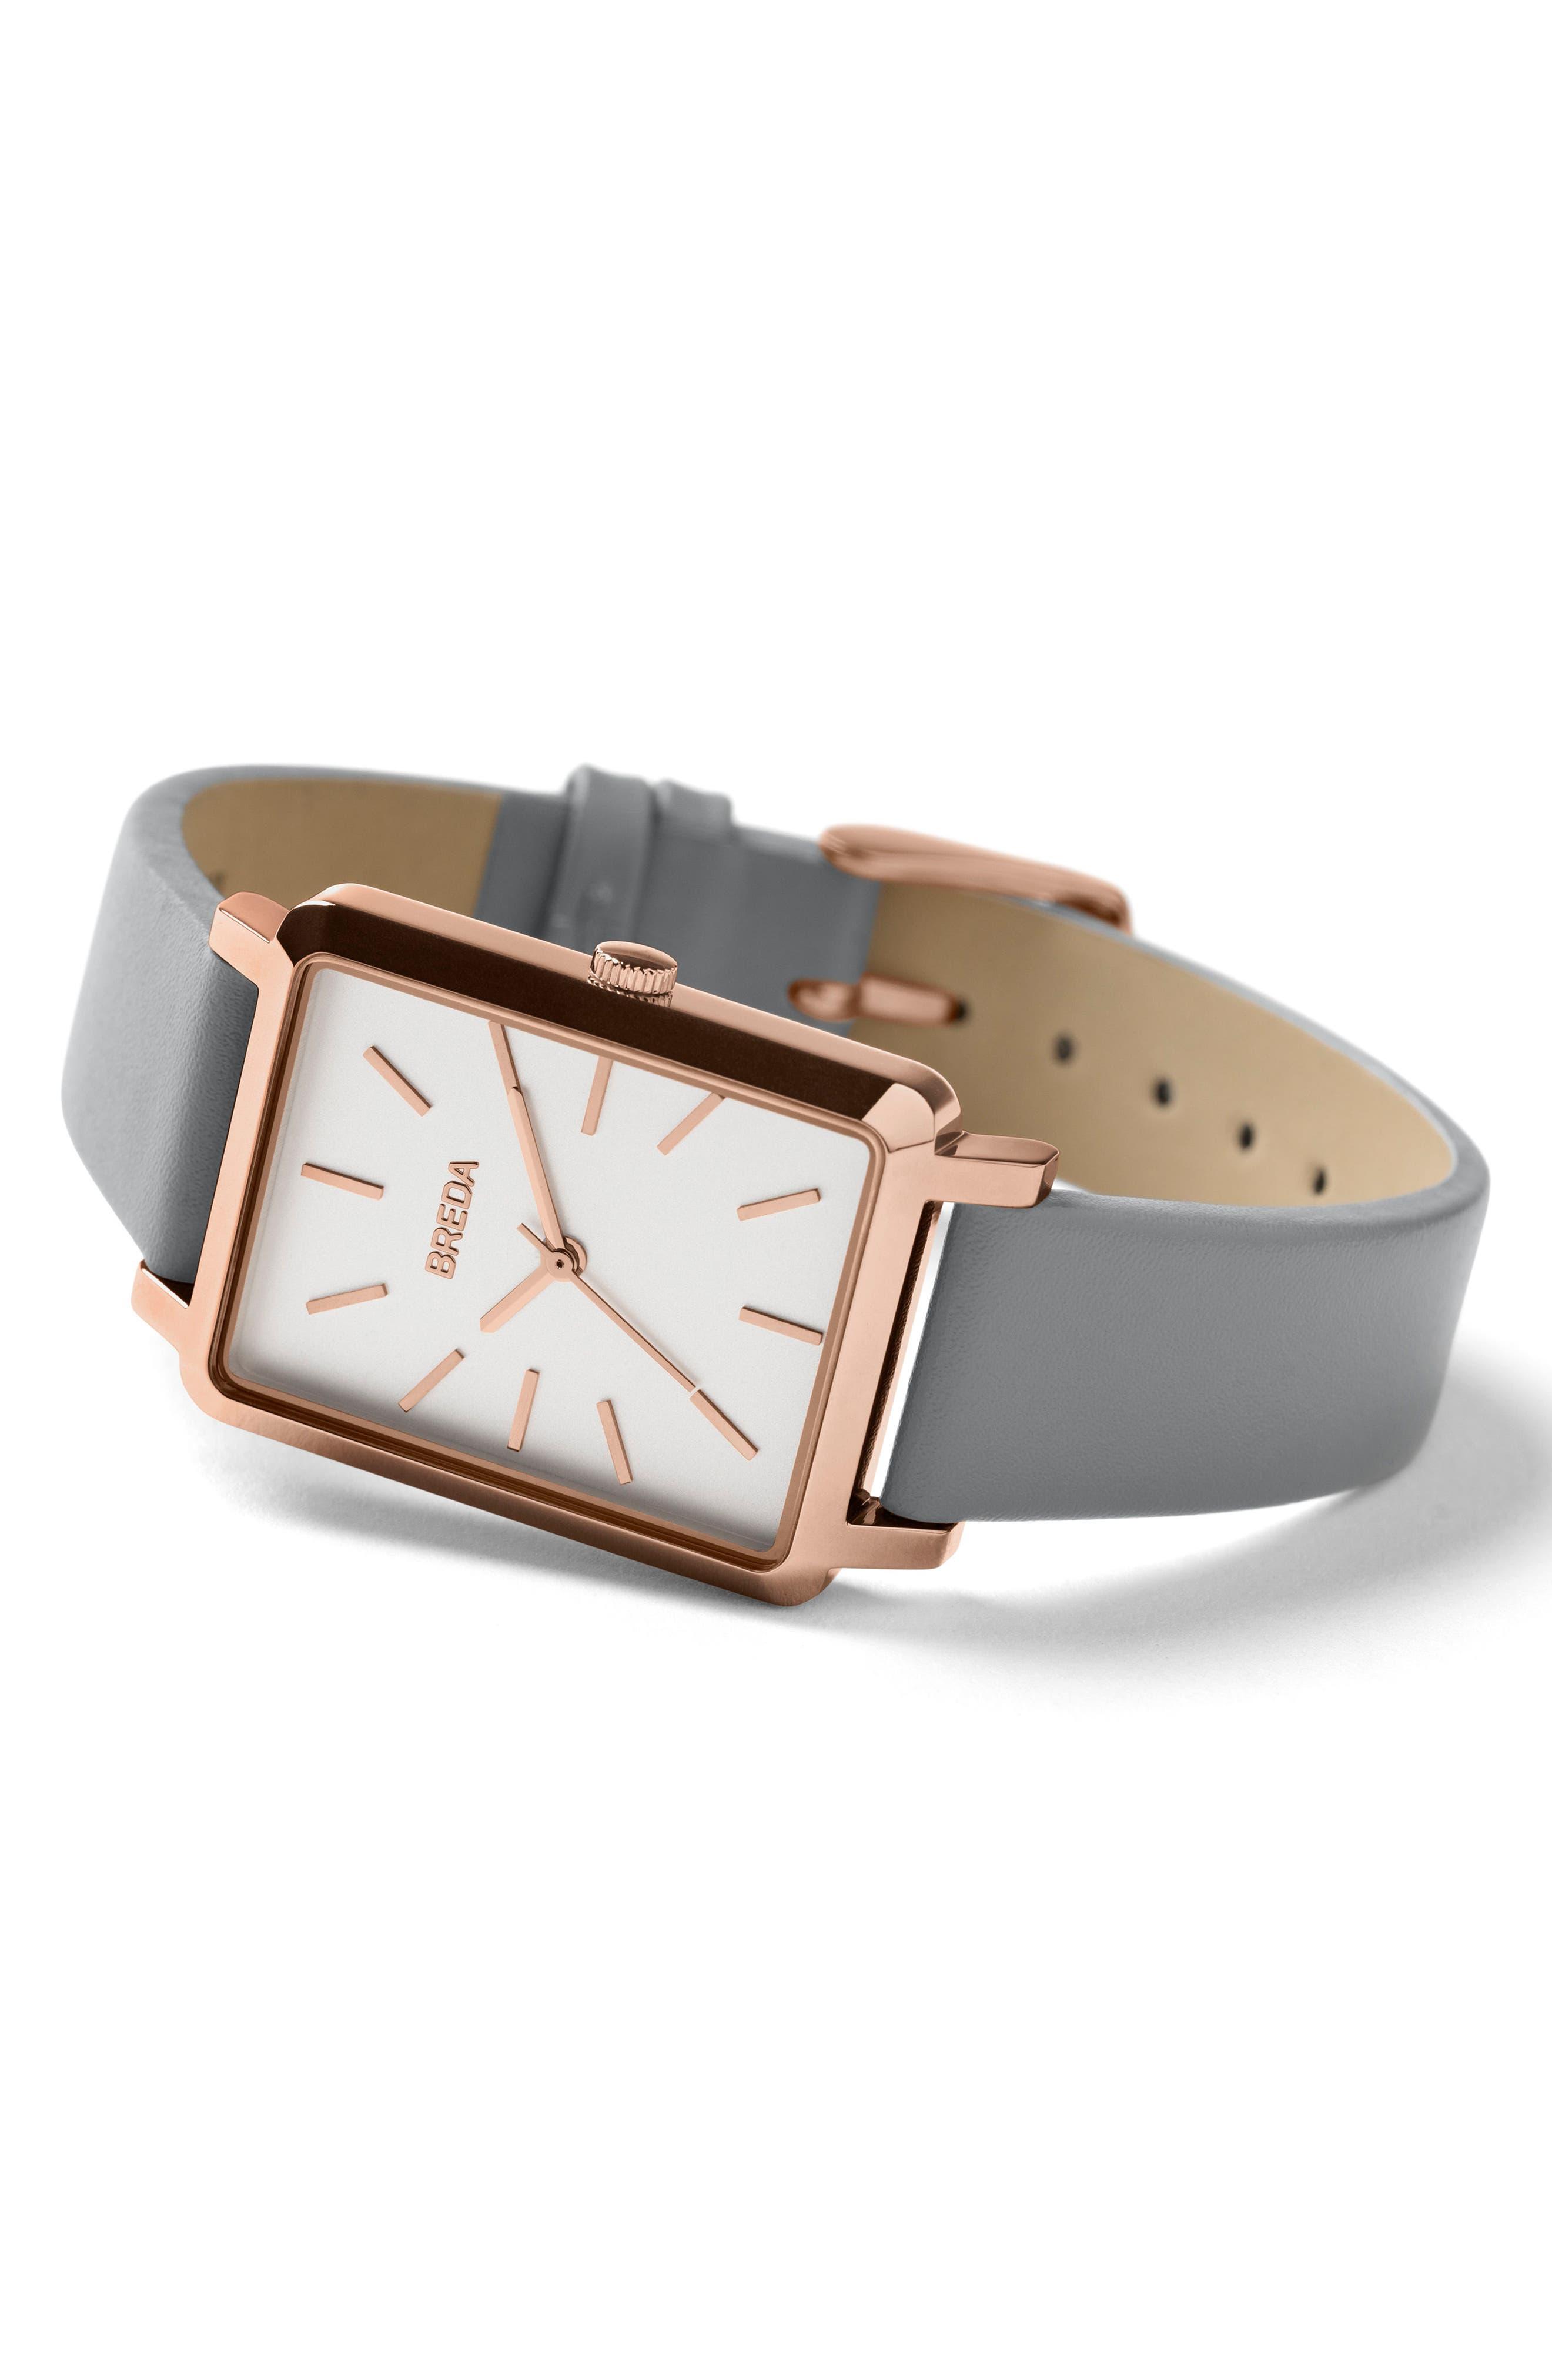 Alternate Image 3  - BREDA Baer Rectangular Leather Strap Watch, 26mm